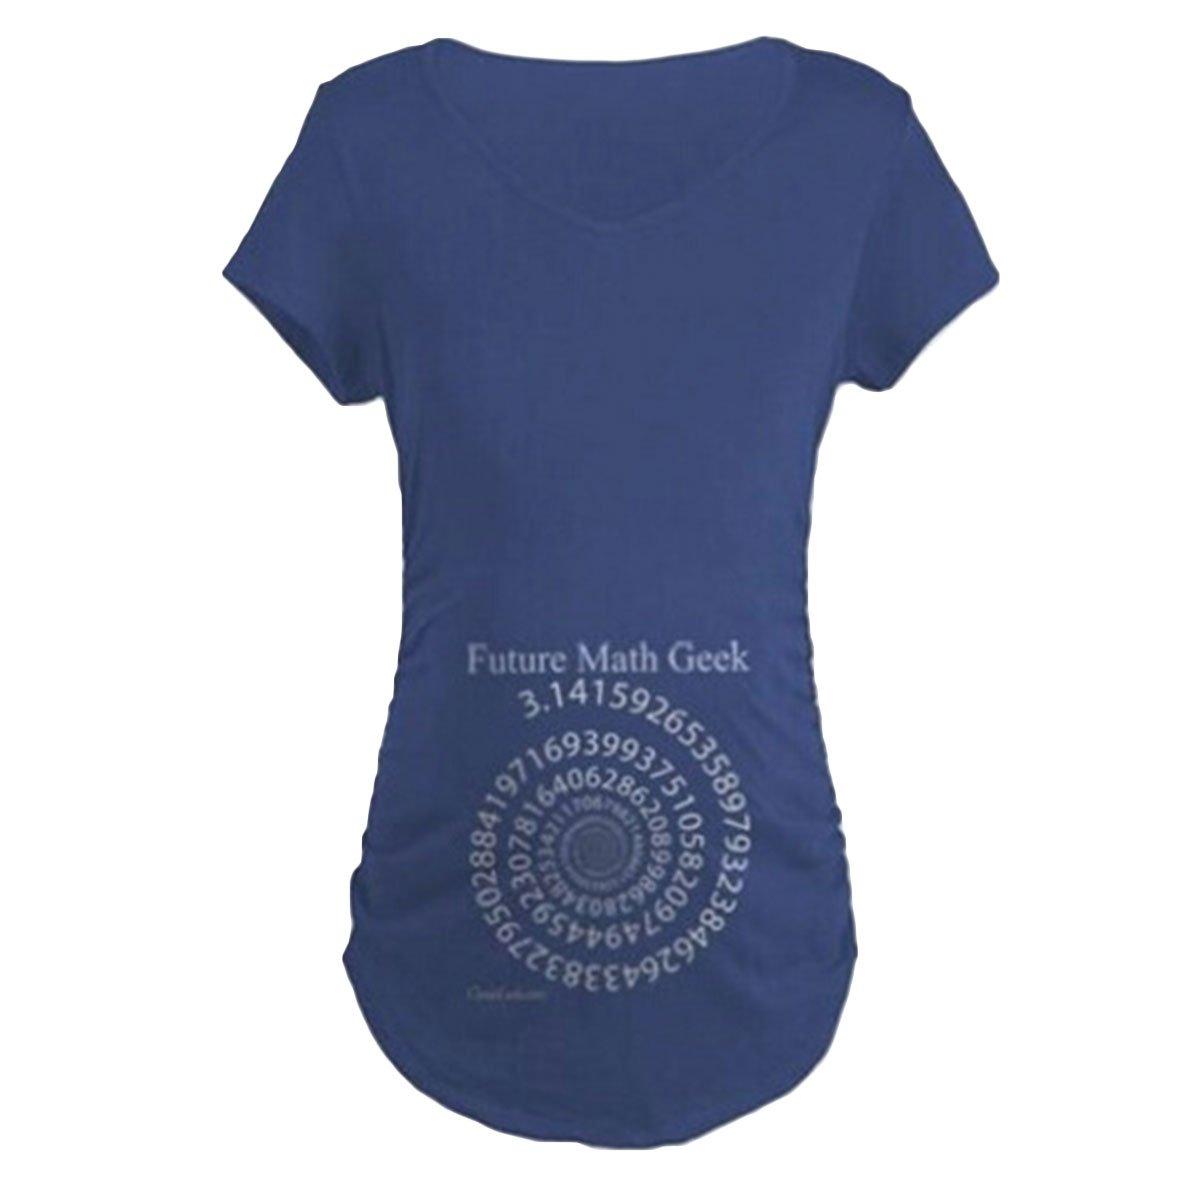 Yogurt Plus Size PI Funny Maternity T-Shirt Pregnancy Top Graphic Tees